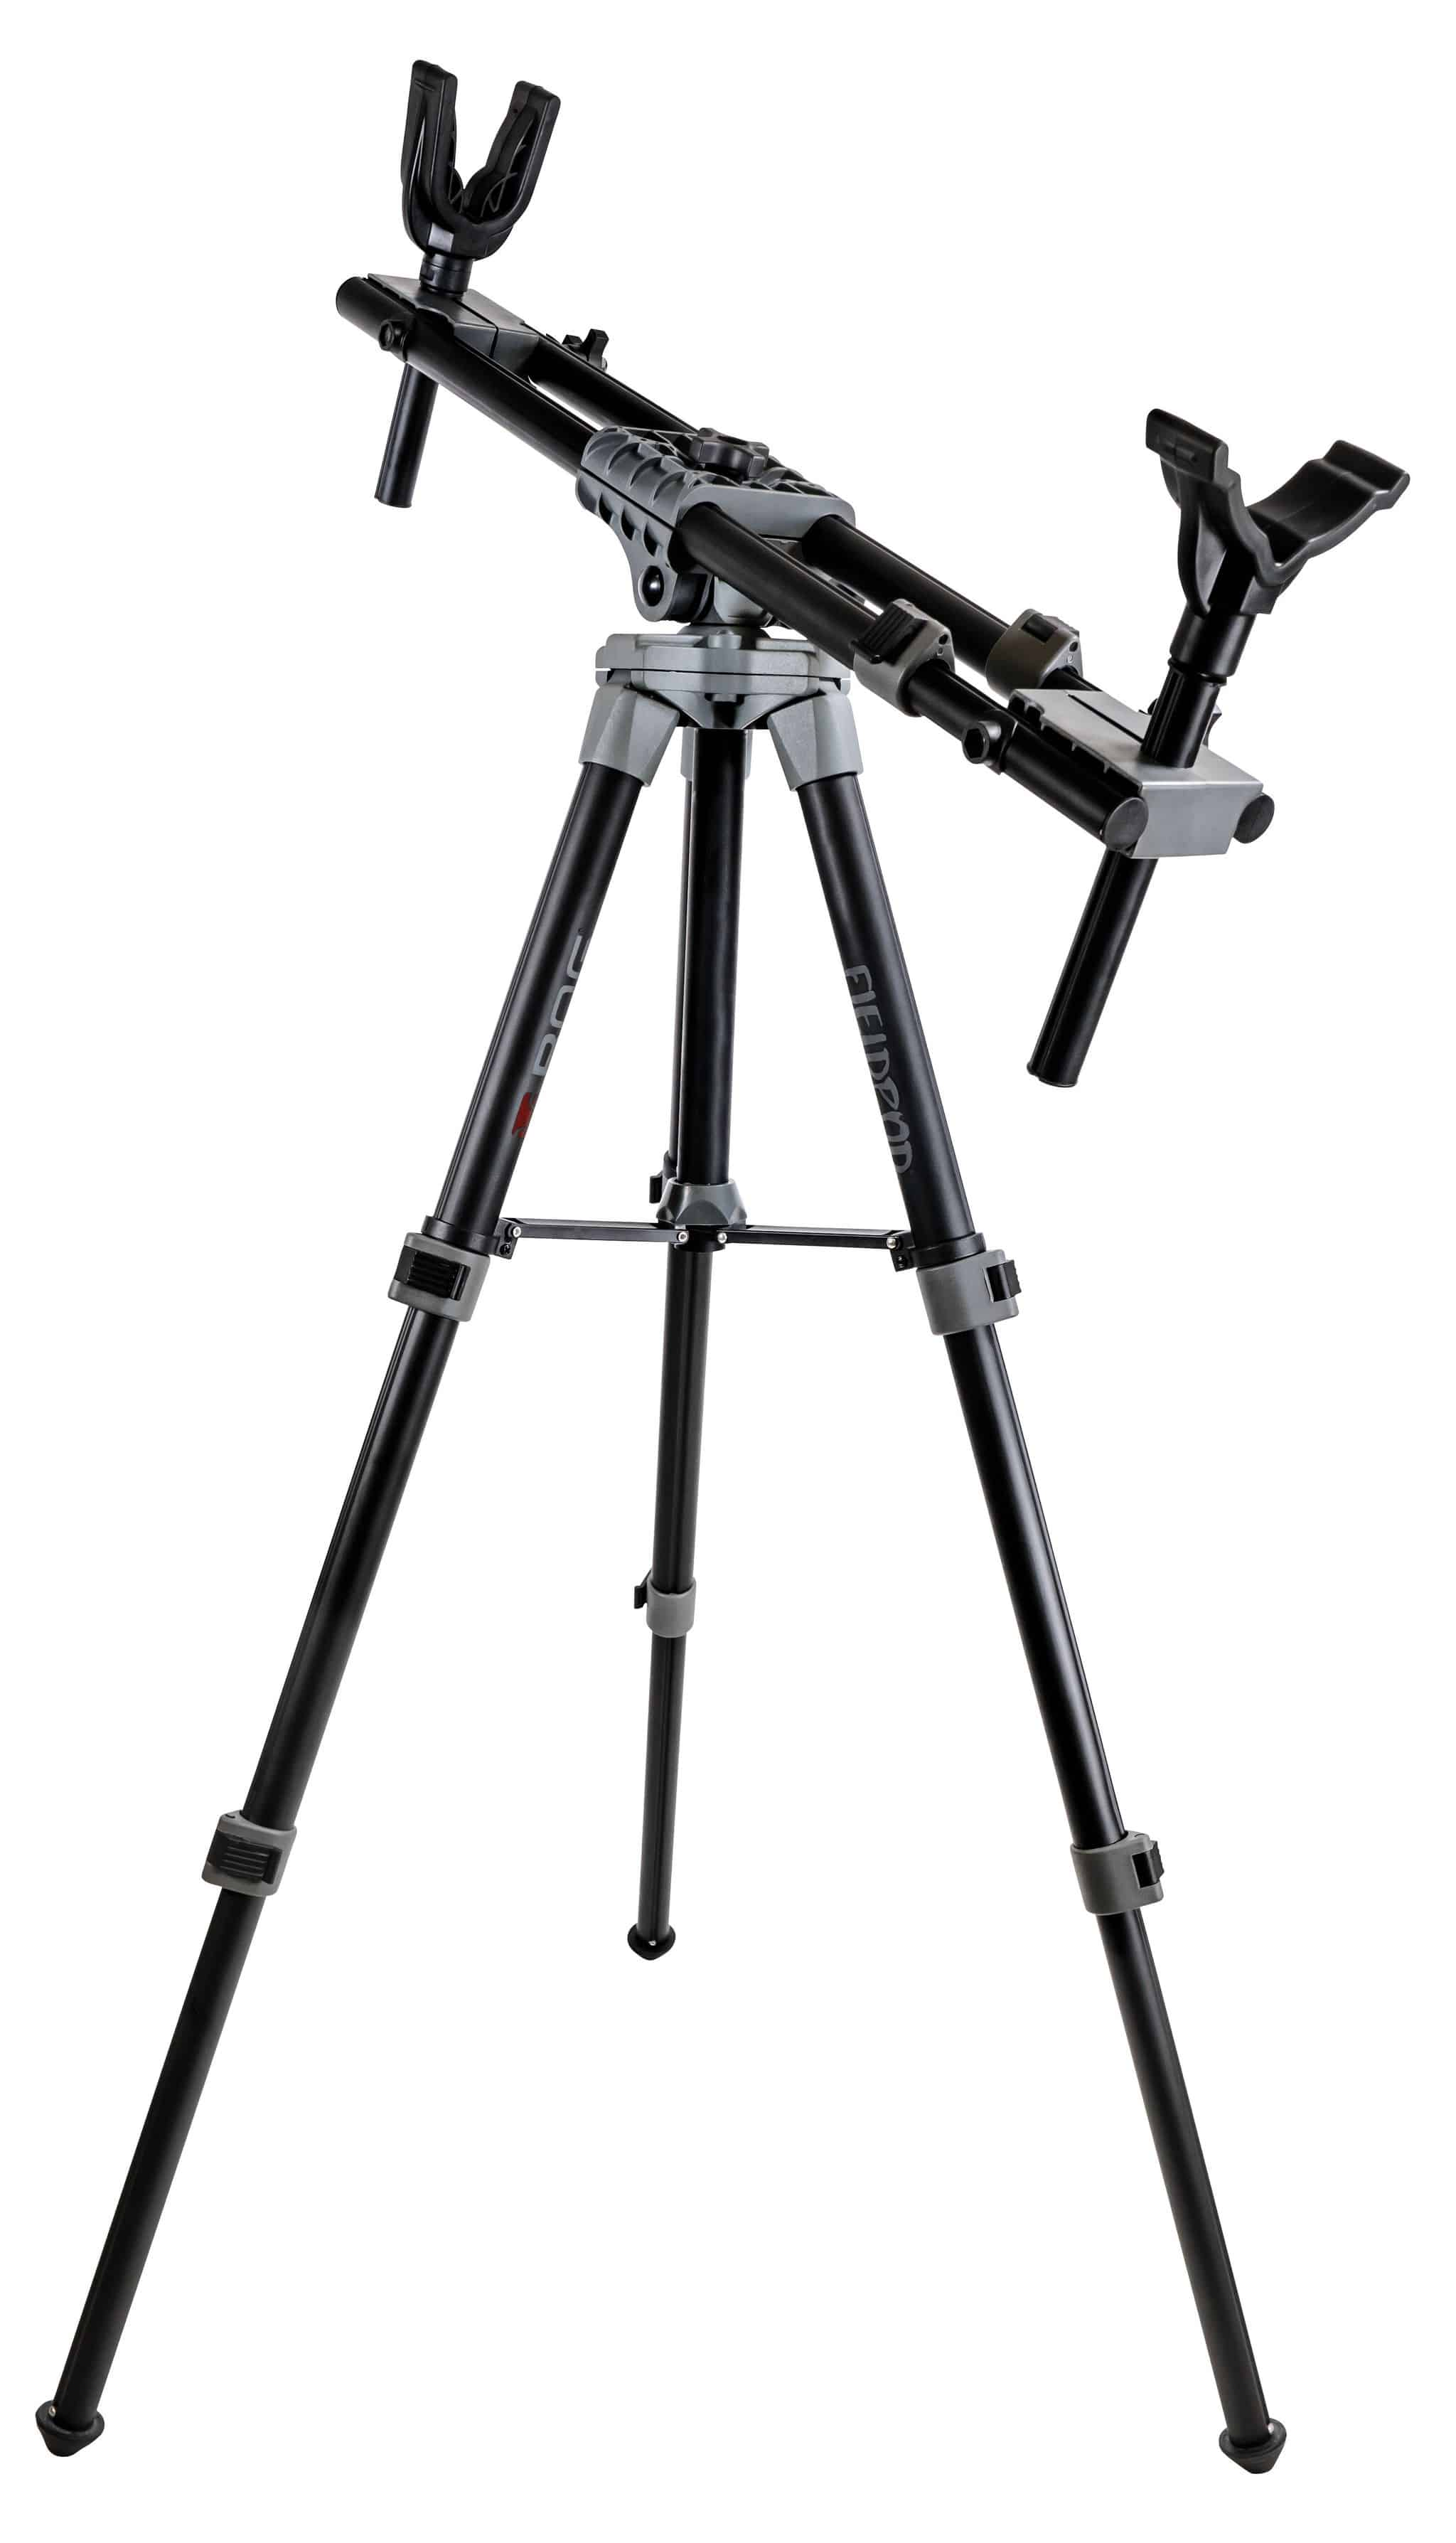 Battenfeld Technologies - Shooting and Gun Cleaning Supplies